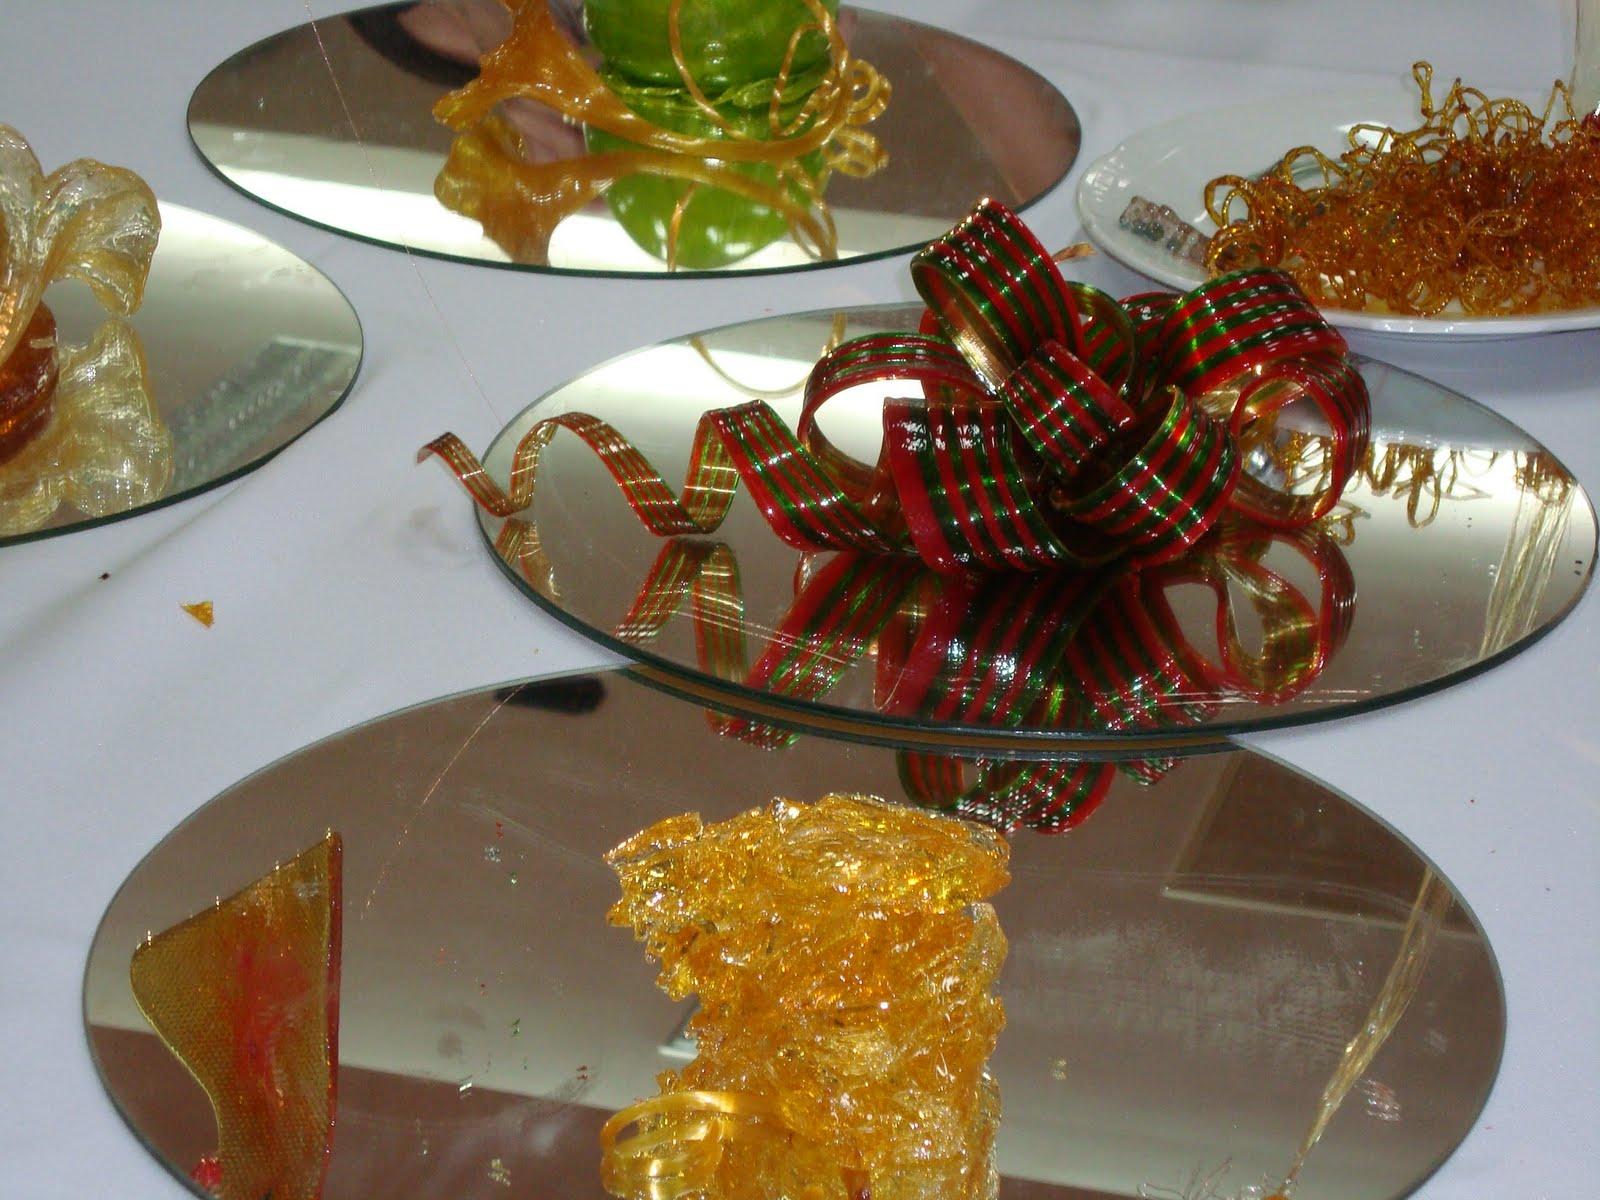 Cocina en casa como hacer adornos de caramelo for Crear decoraciones para casa